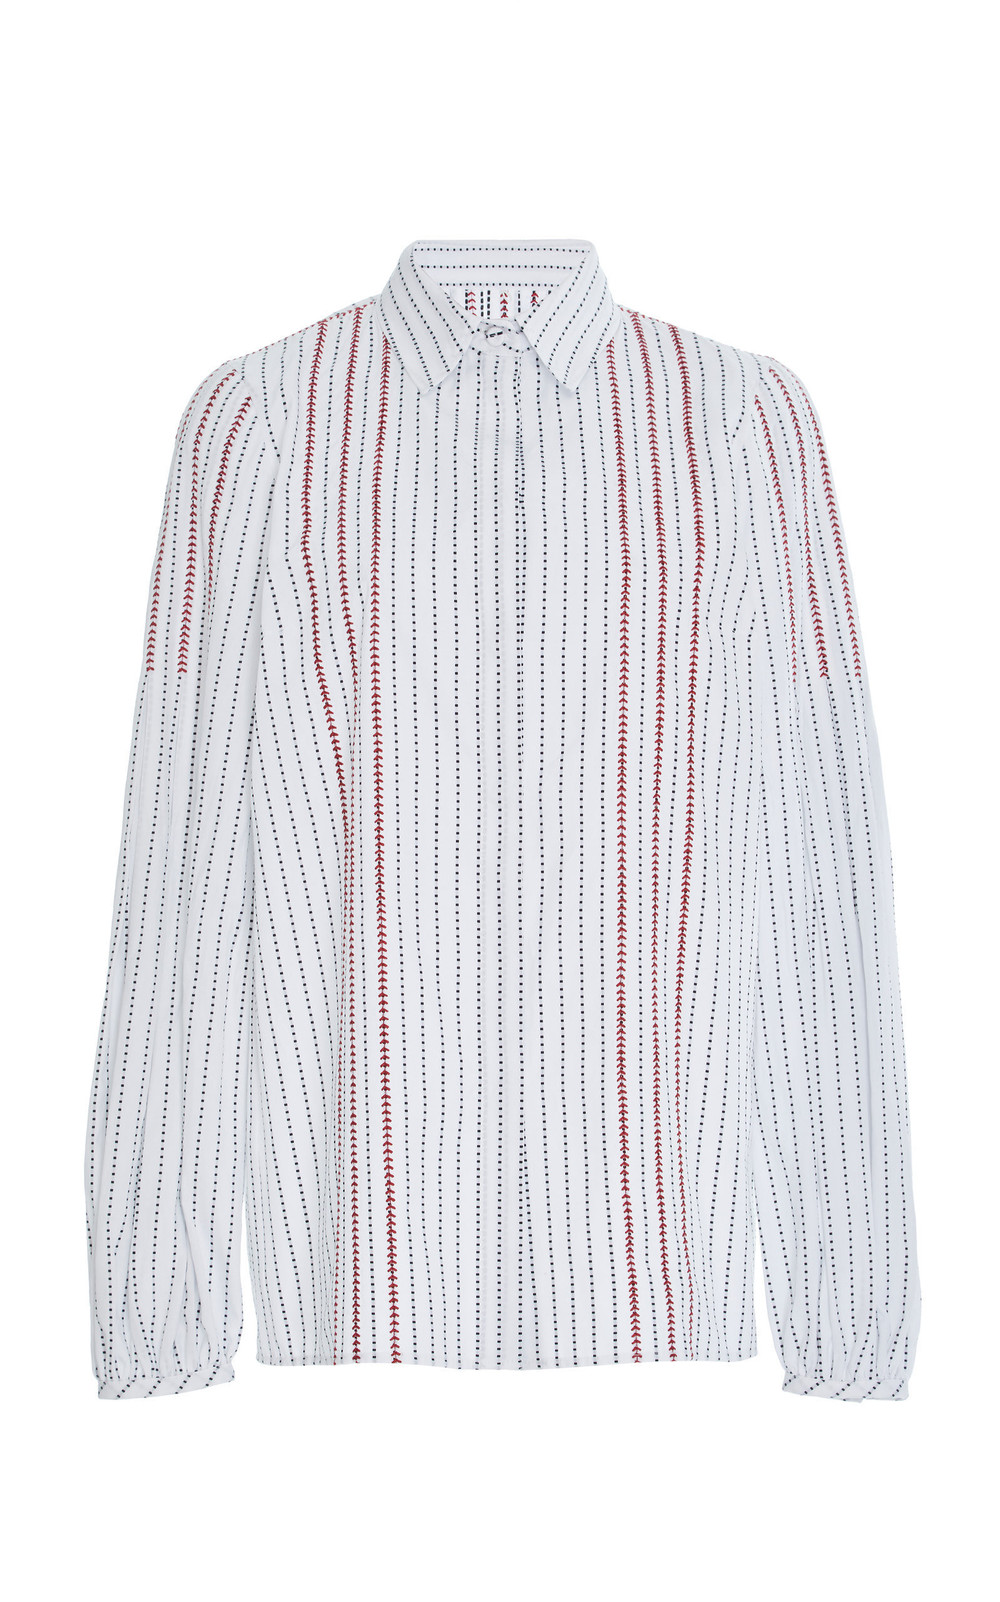 Gabriela Hearst Wight Cotton Poplin Shirt in black